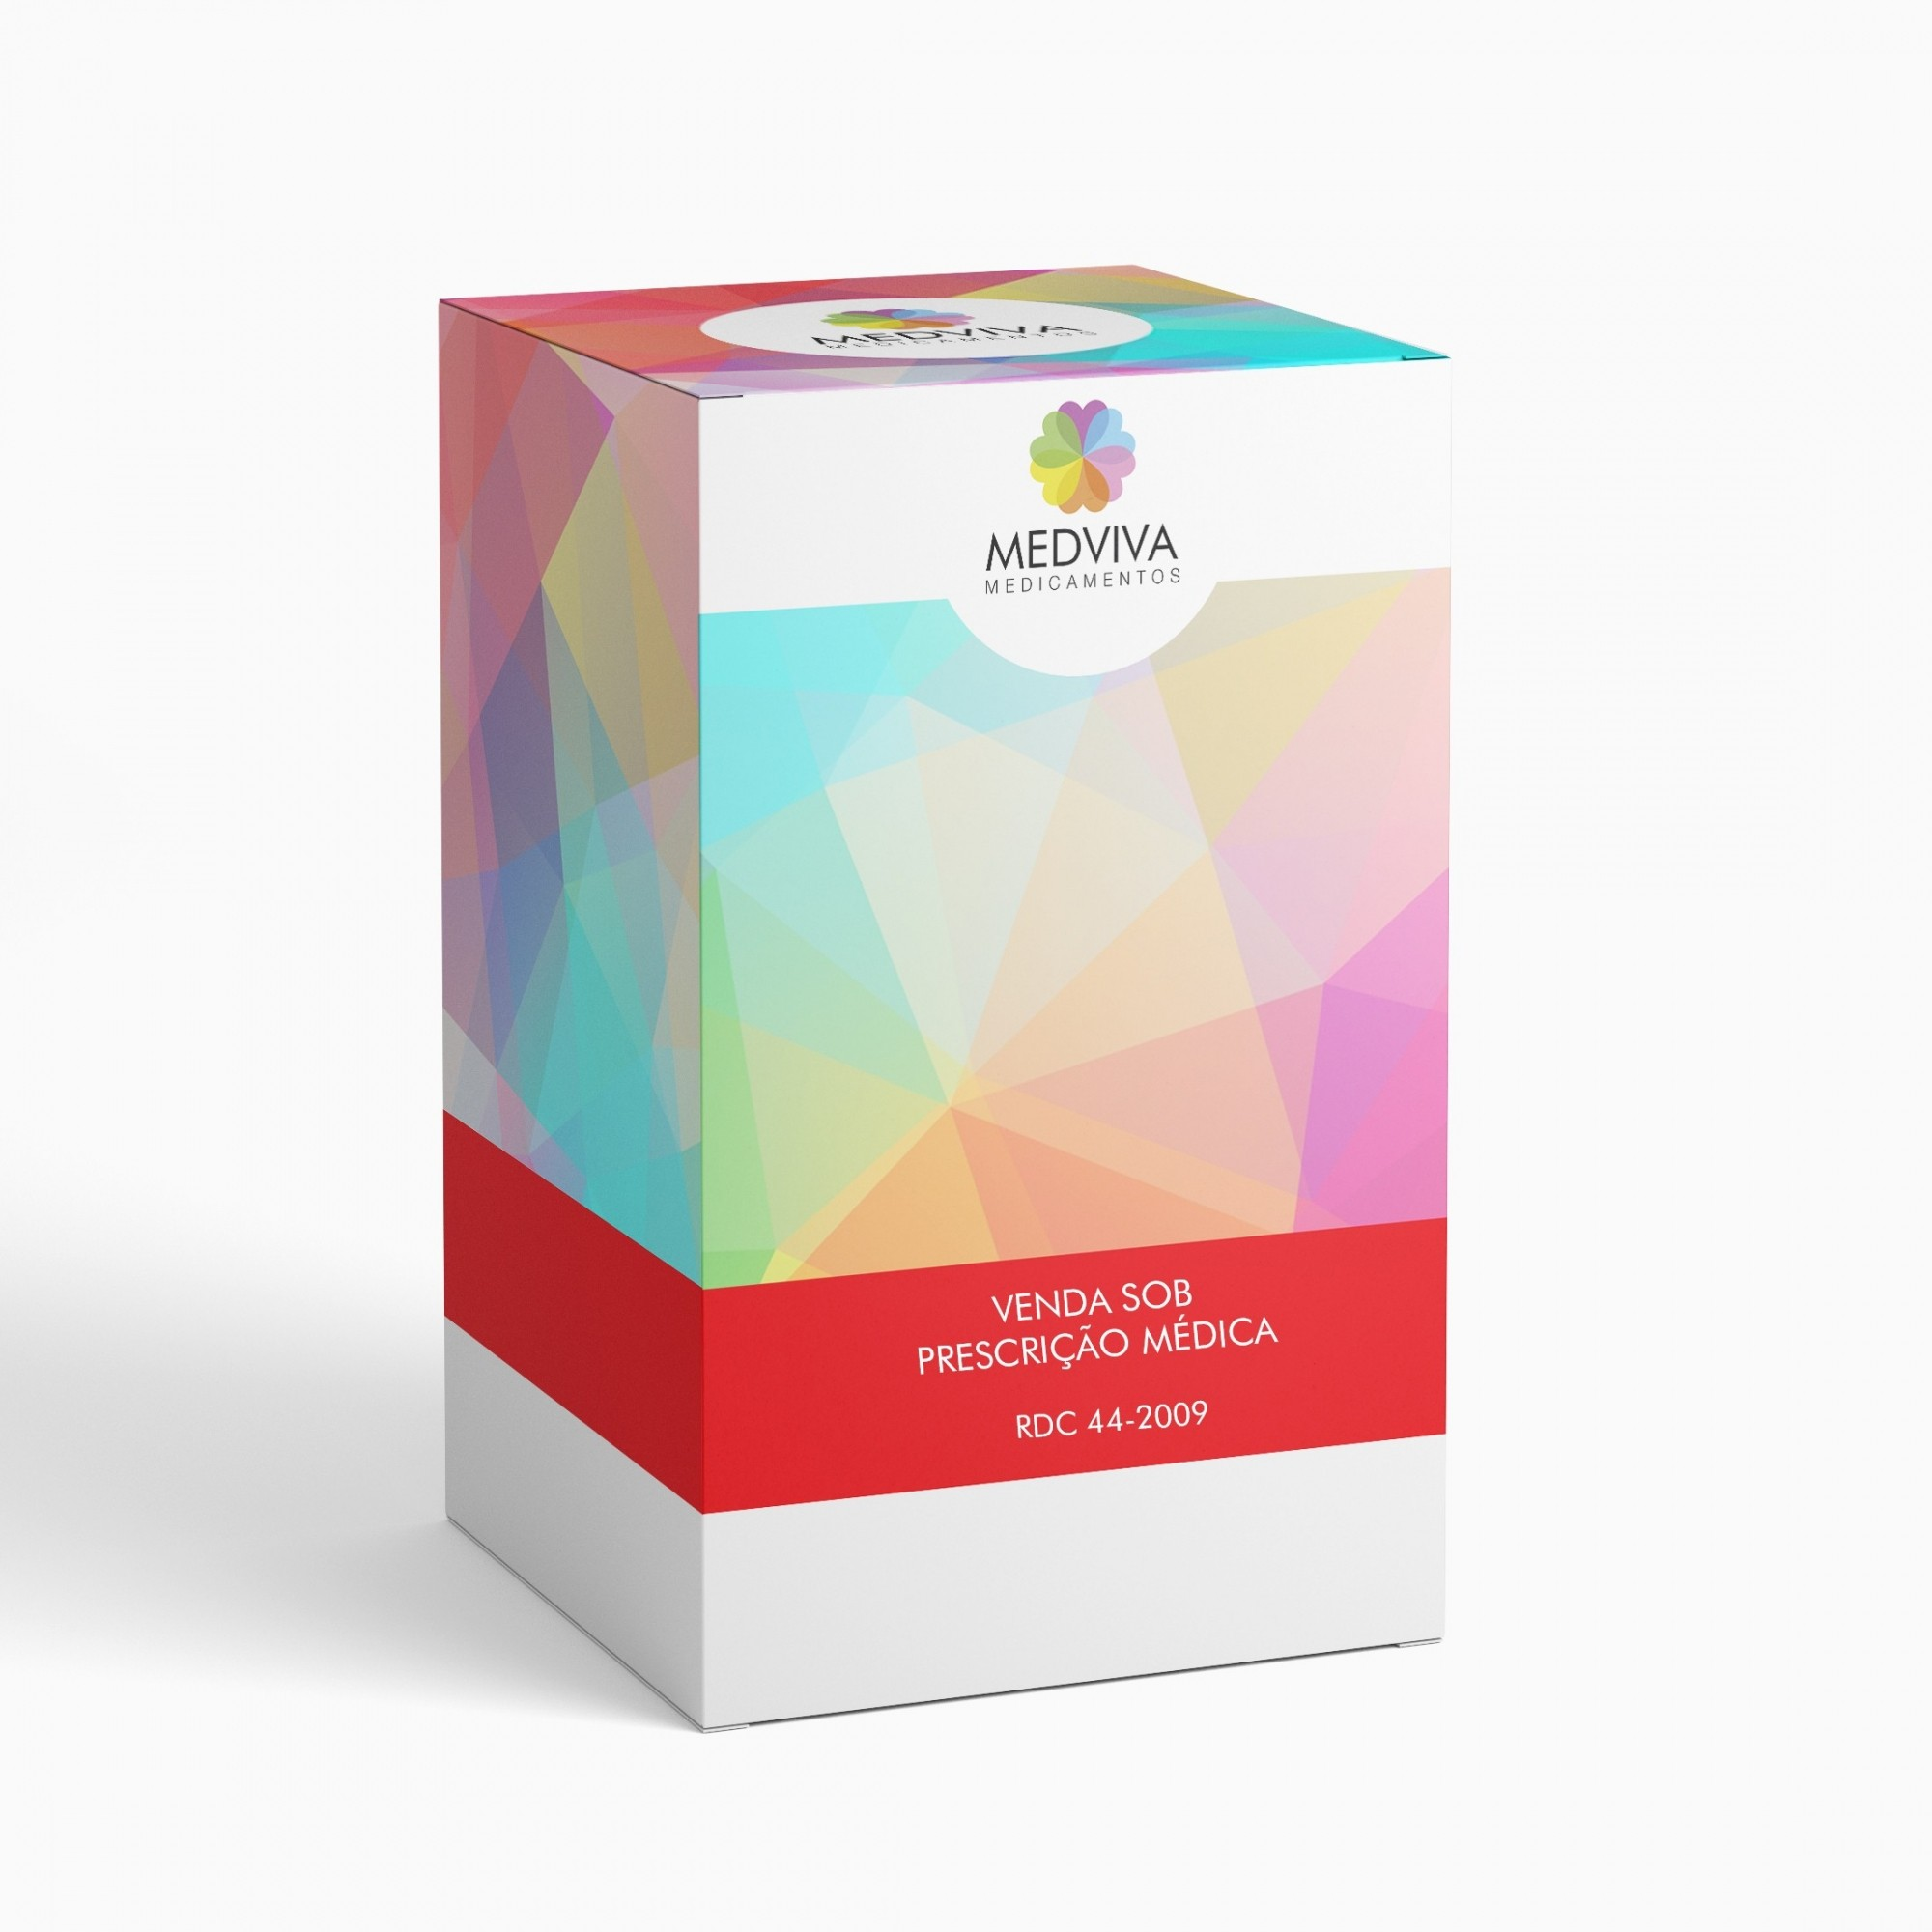 Diovan Hct 160 mg 12,5 mg 28 Comprimidos